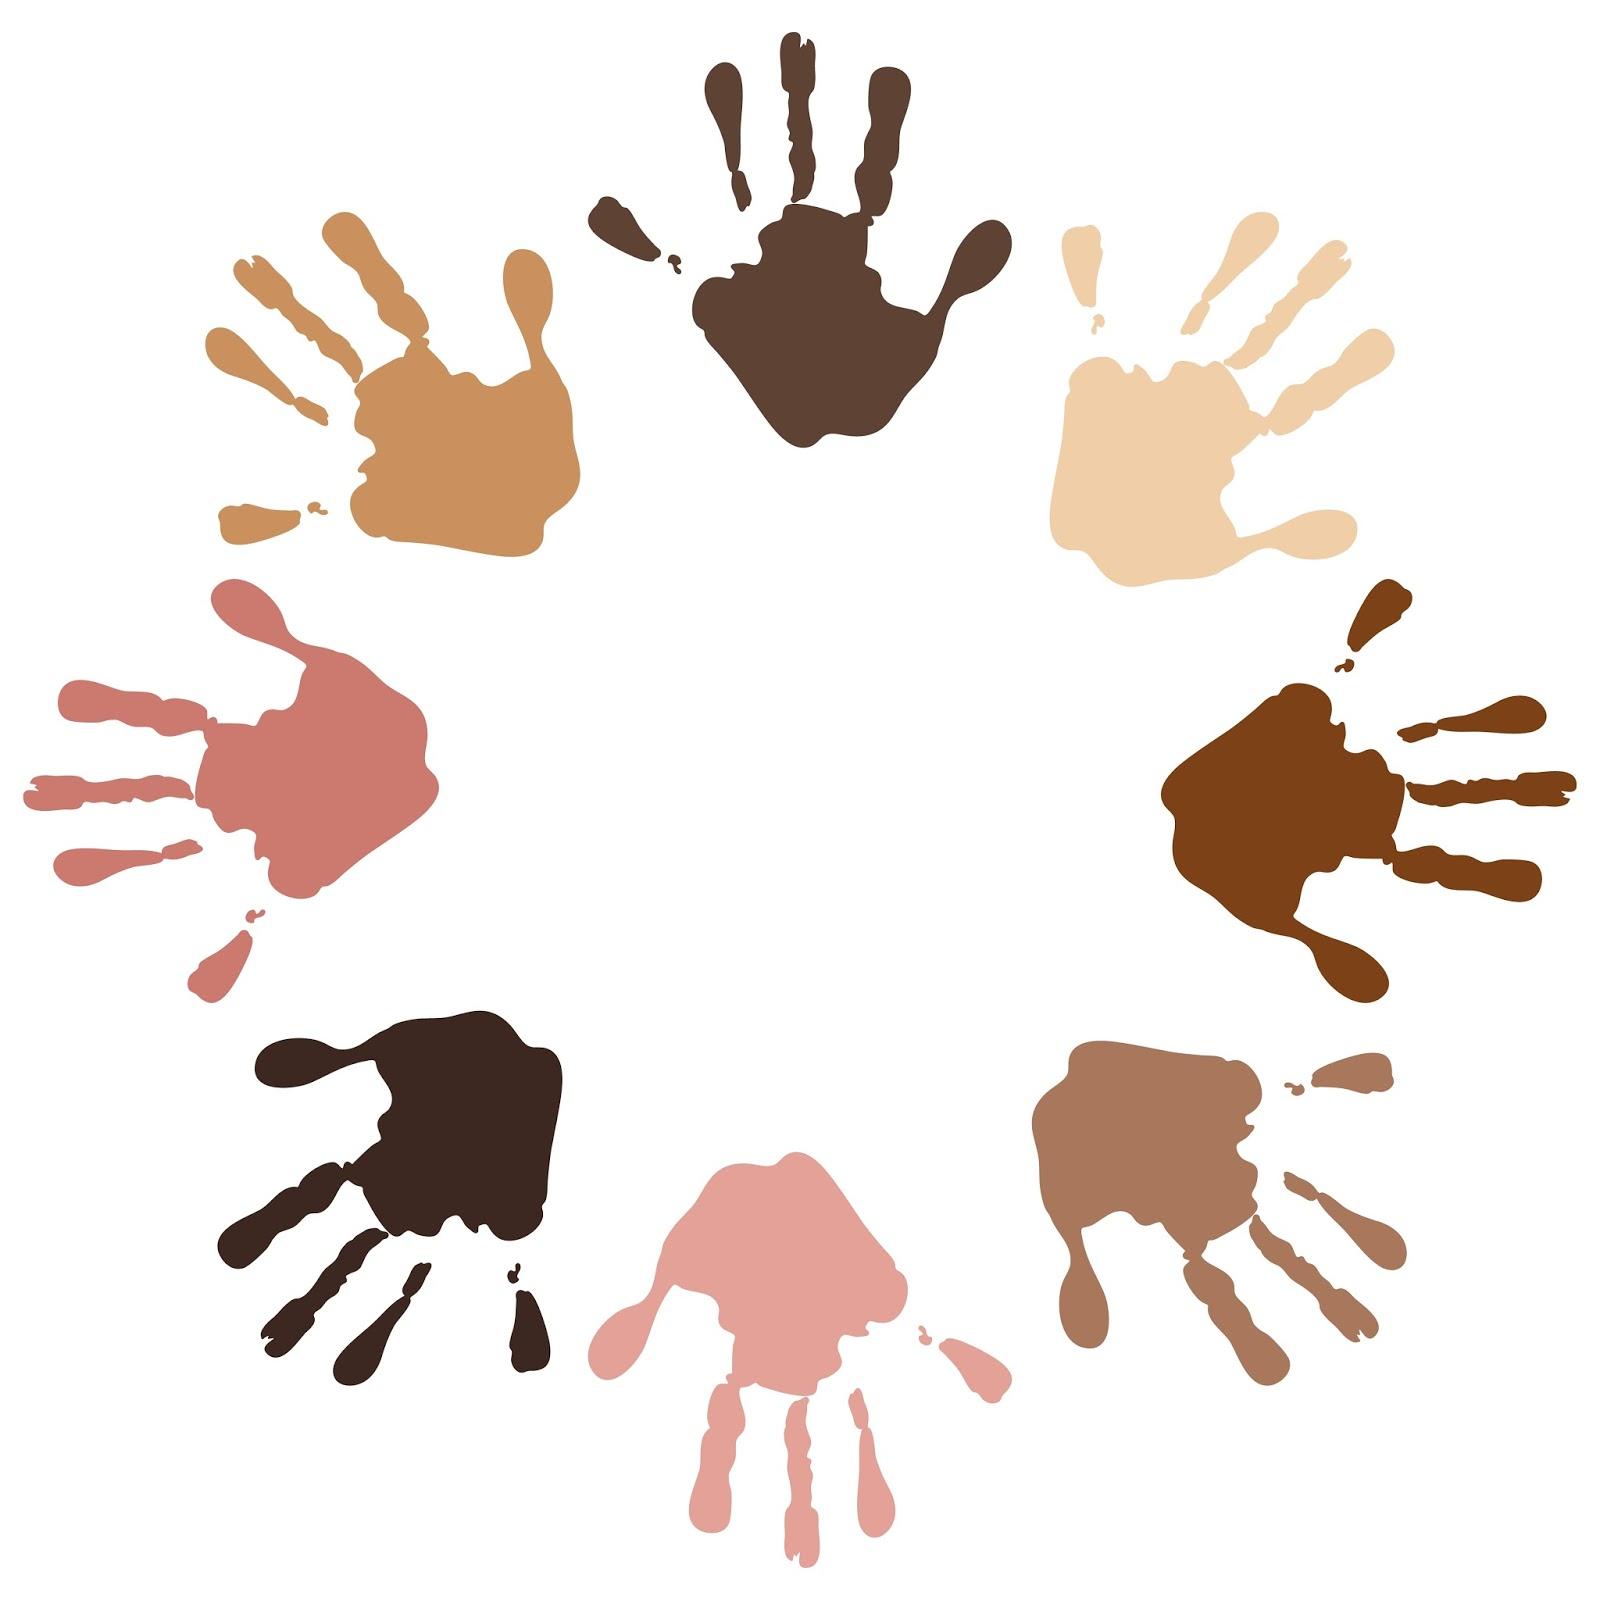 multimedia essay human dignity human dignity